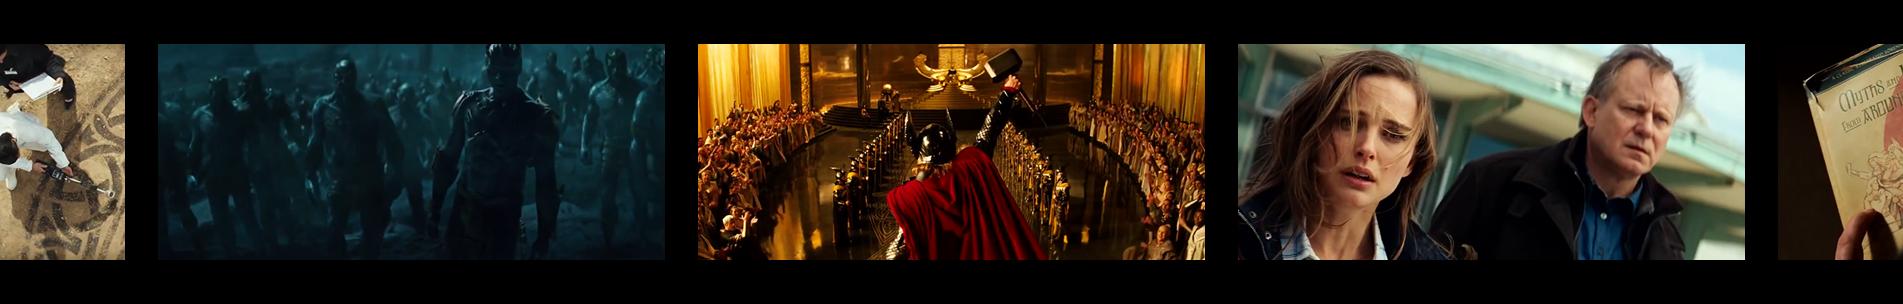 "Pellicule ""Thor"""